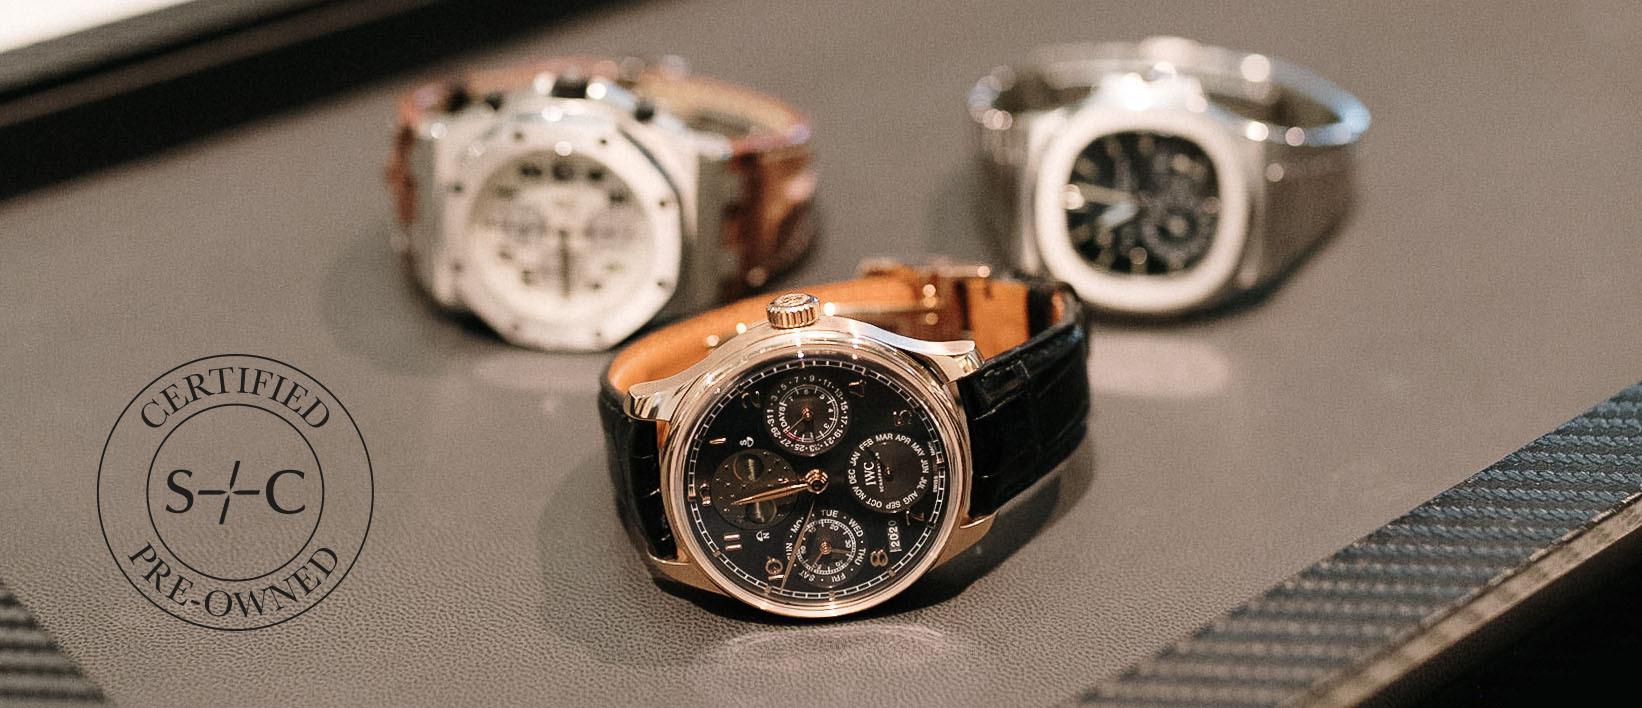 3 unieke Pre-owned & vintage horloges, die je als horloge-liefhebber niet wilt missen!